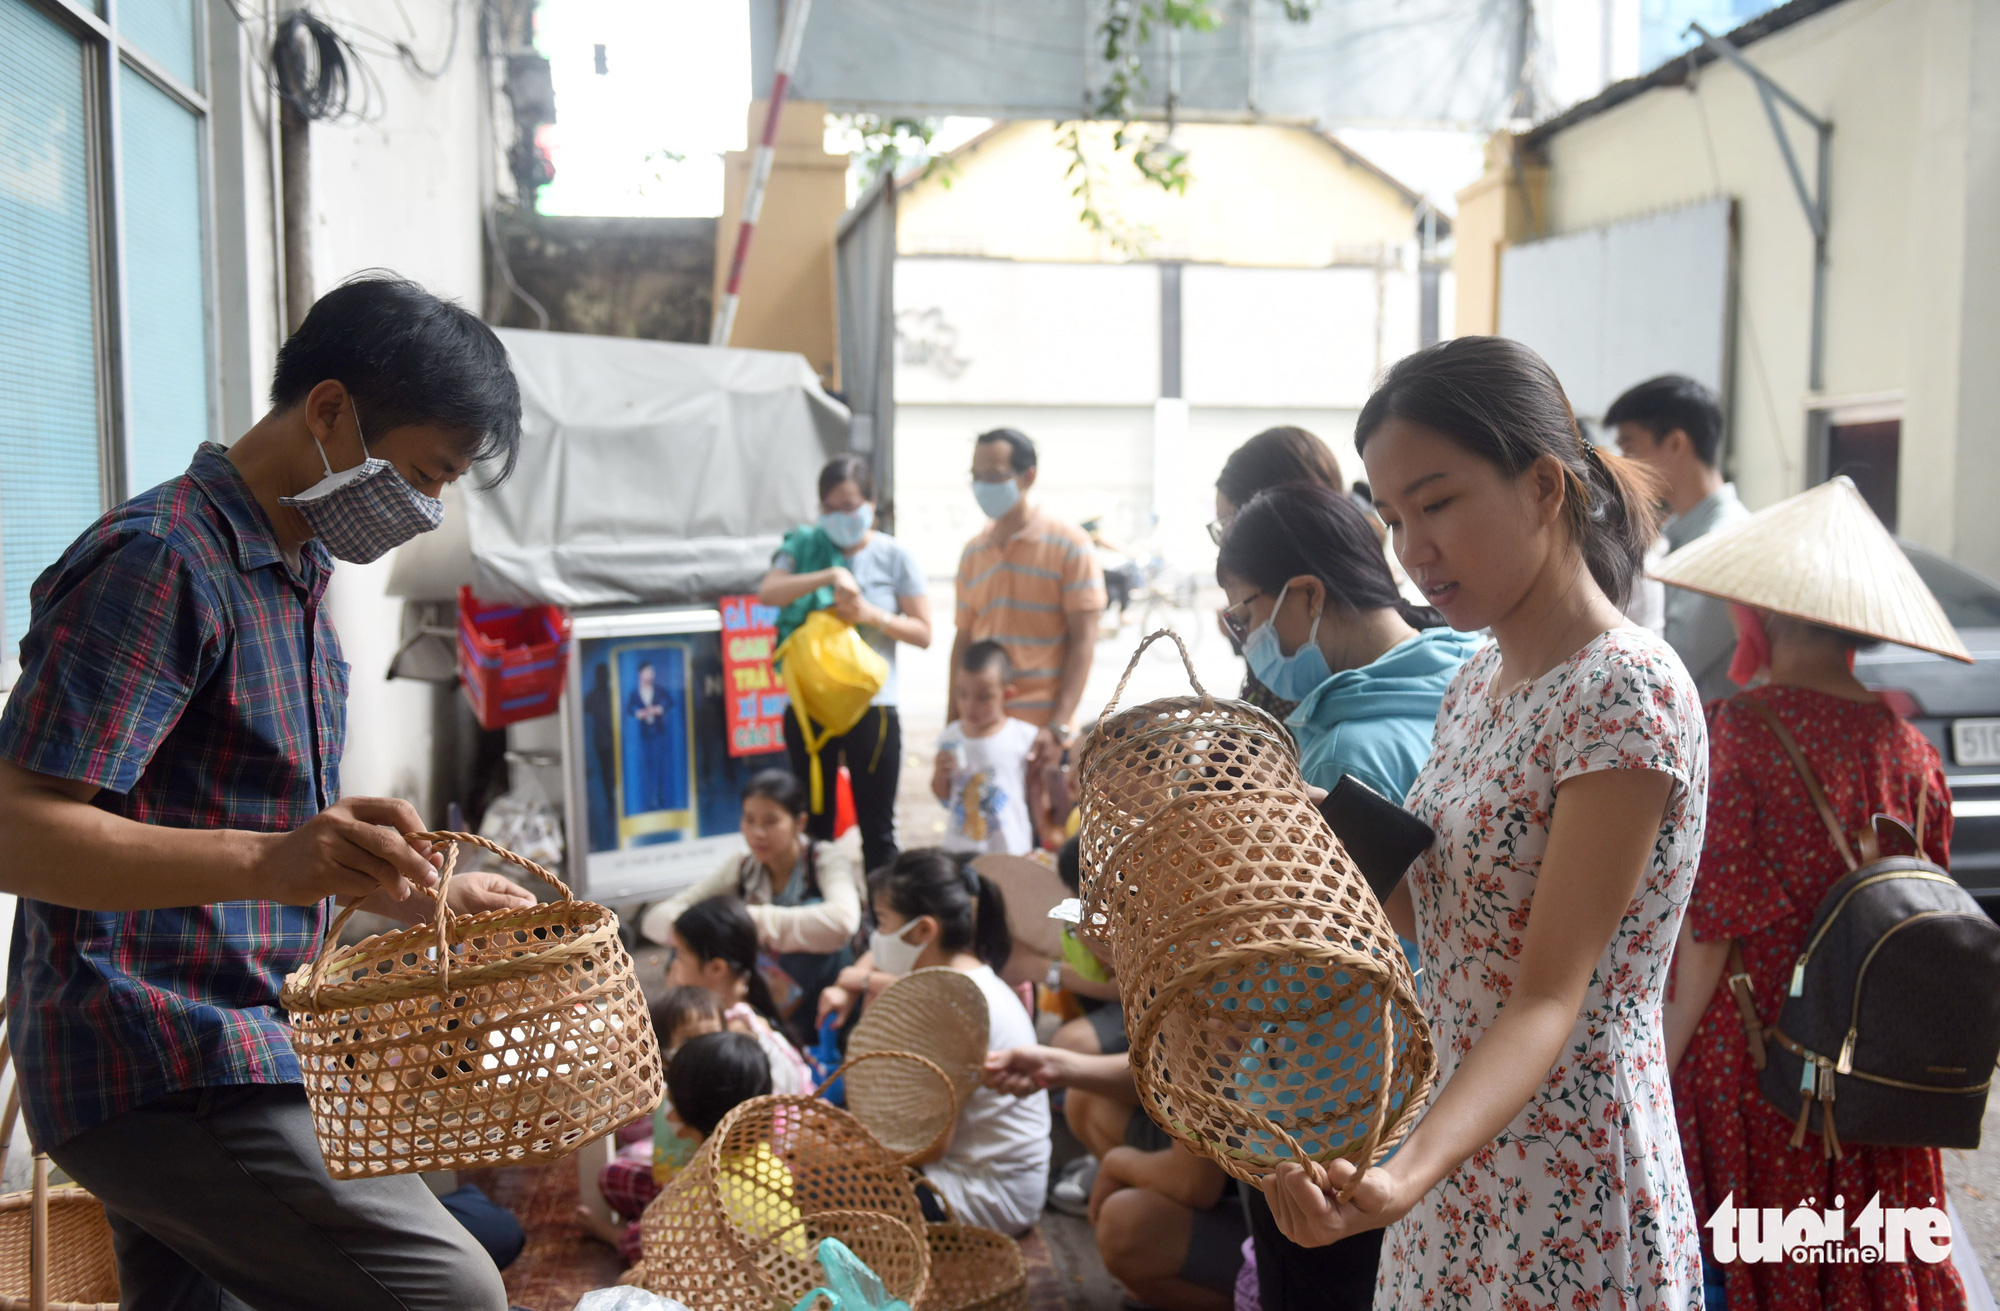 Nguyen Anh Thu (right) selects handmade baskets at a 'countryside market' at No. 7 Nguyen Thi Minh Khai Street, District 1, Ho Chi Minh City, Vietnam, May 24, 2020. Photo: Duyen Phan / Tuoi Tre